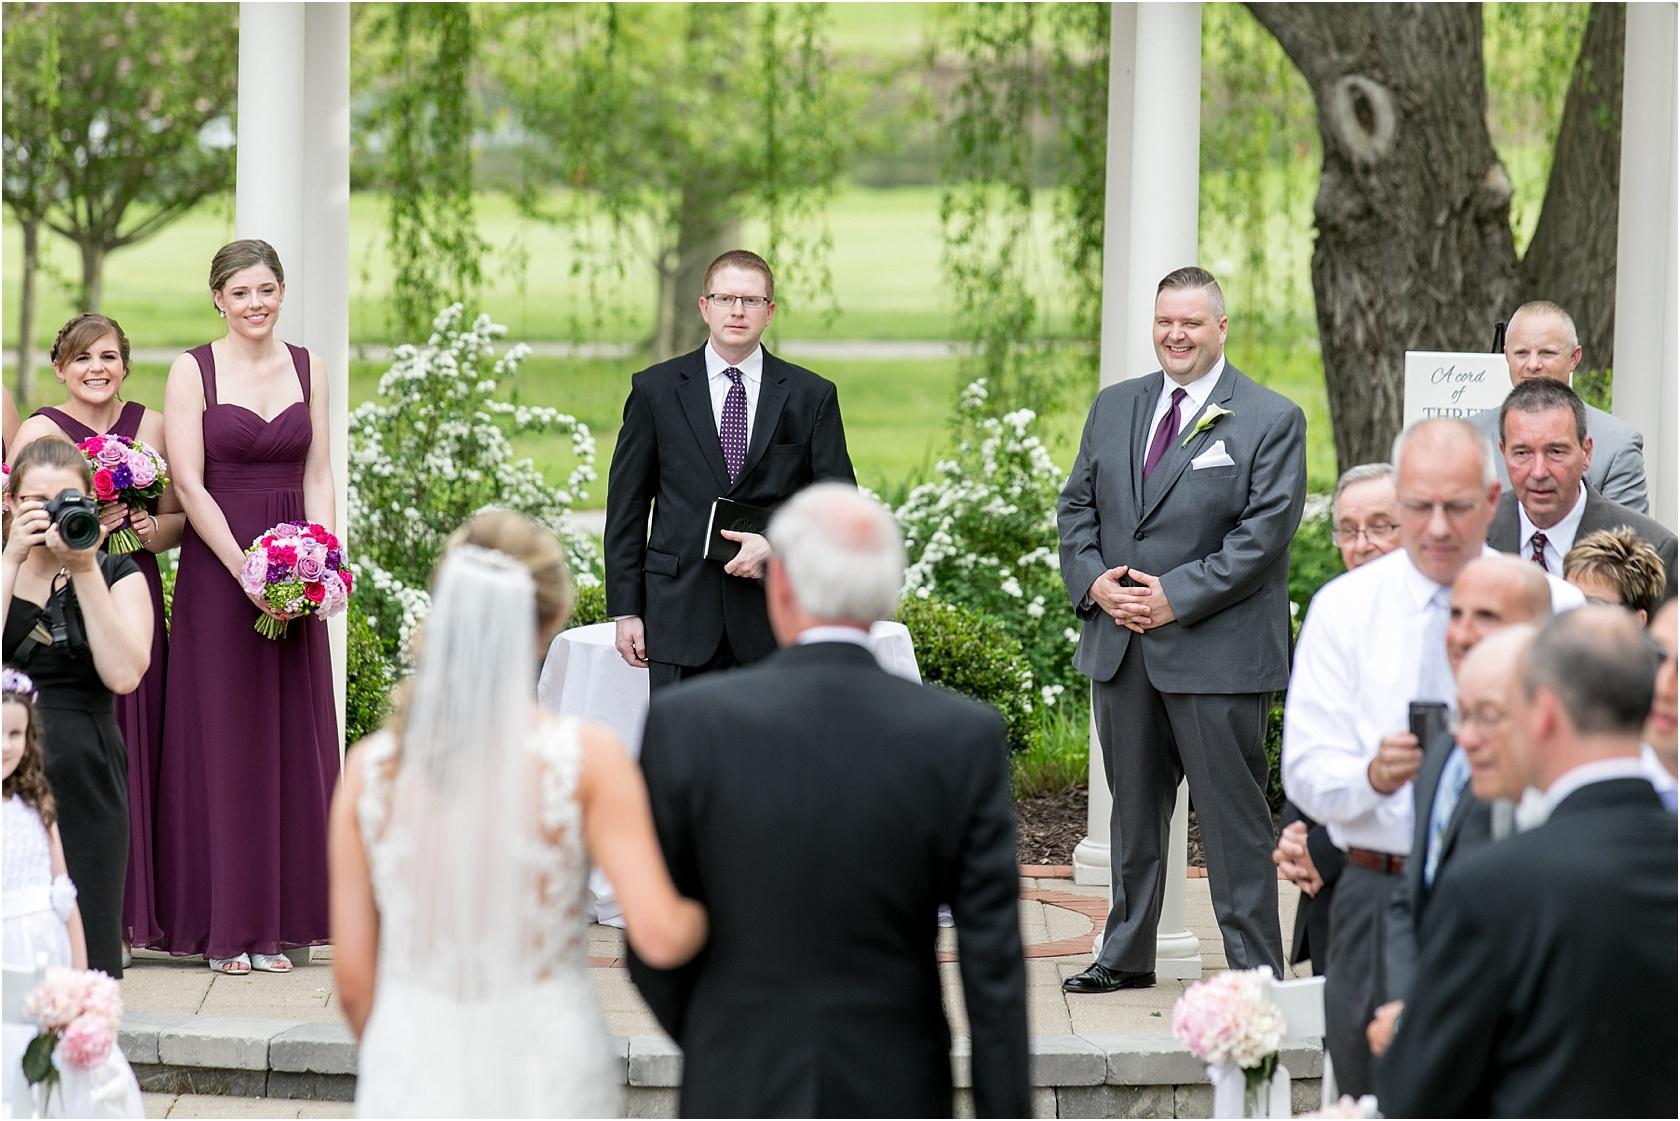 Sagal Wedding Turf Valley Resort Wedding Living Radiant Photography_0077.jpg